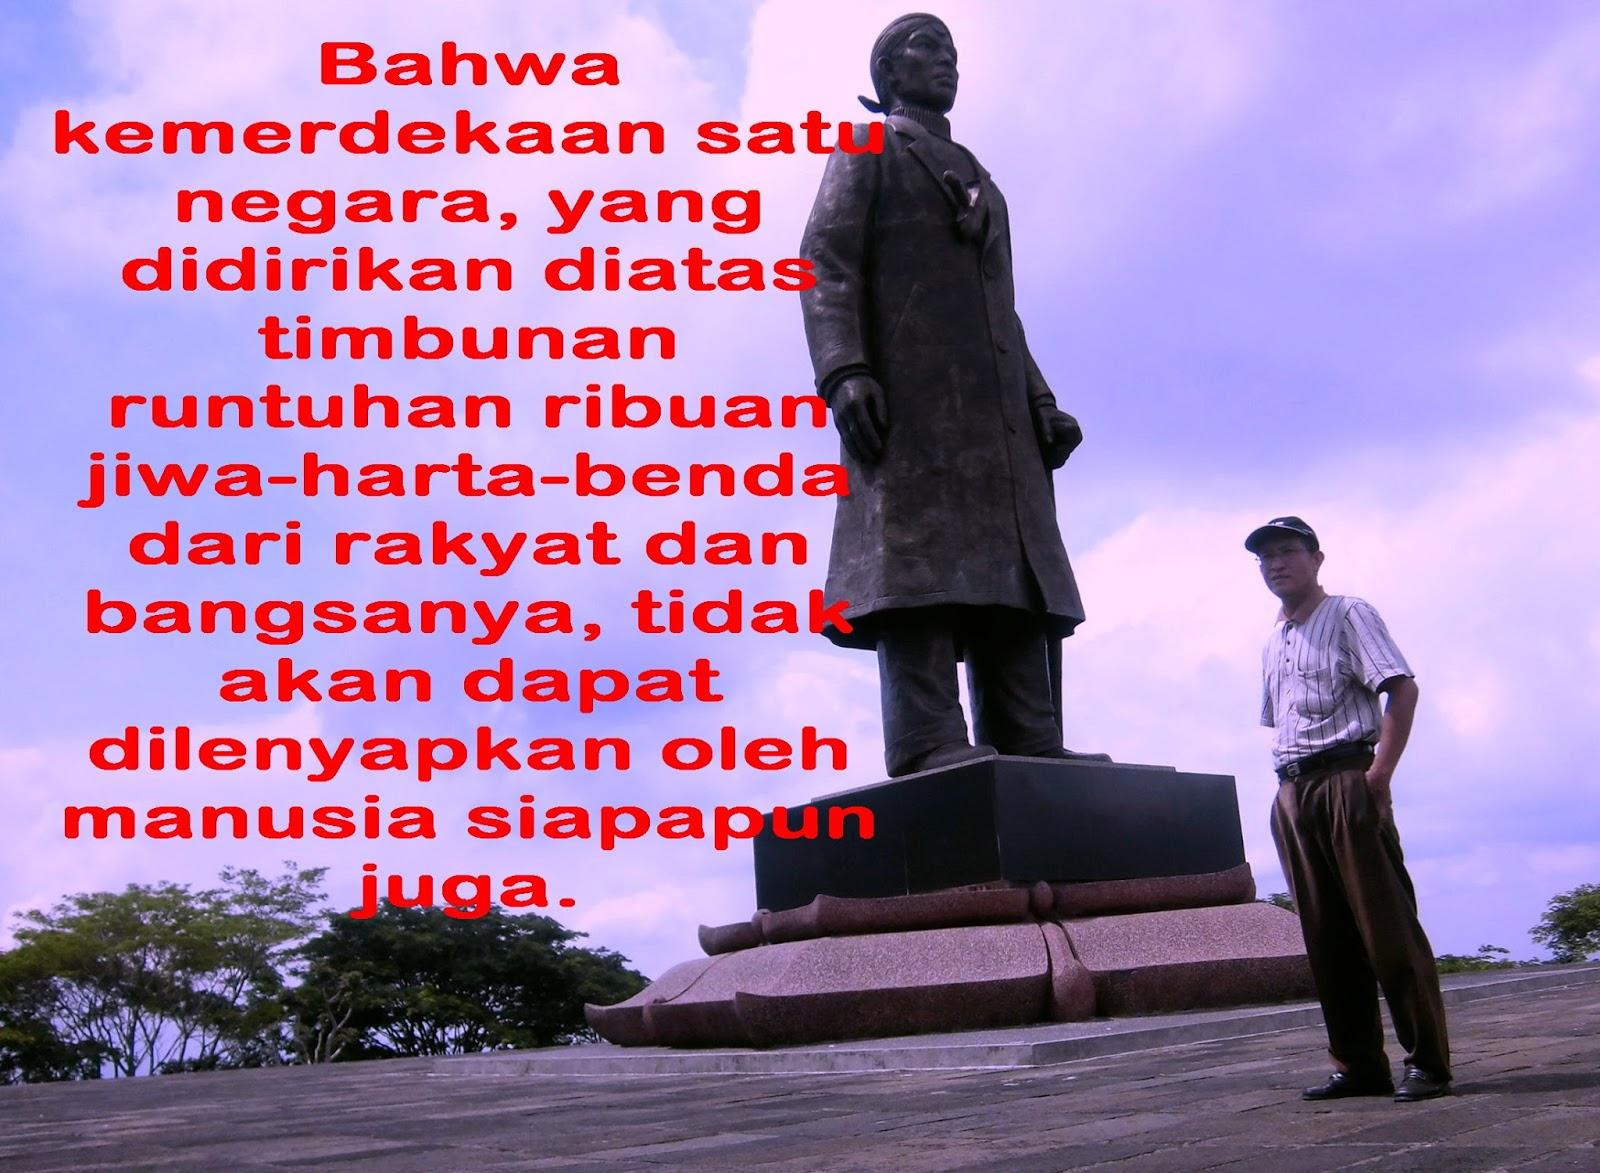 Firdaus Ubaidillah Jelajah Rute Gerilya Pb Soedirman Diy Jateng Makin